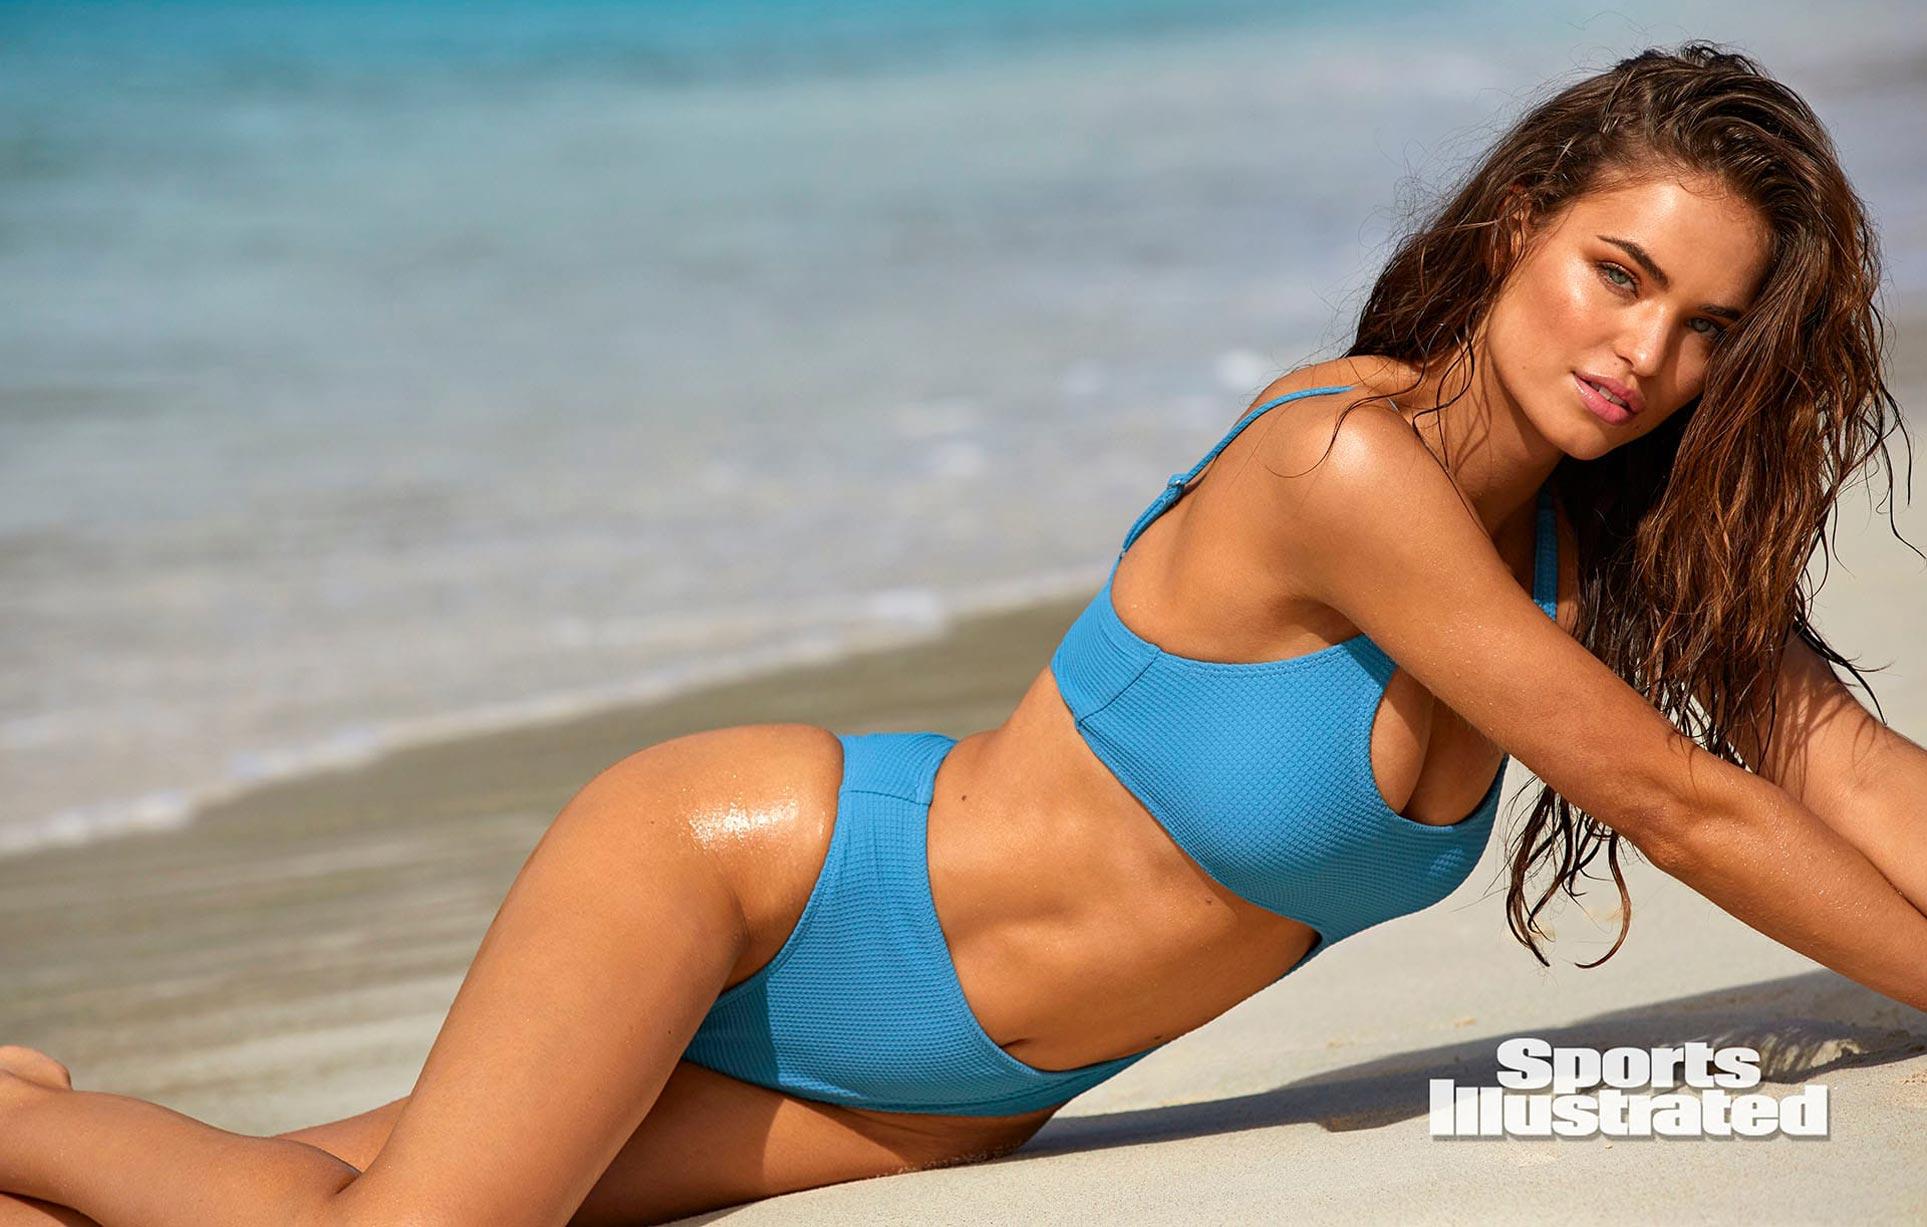 Робин Хольцкен в каталоге купальников Sports Illustrated Swimsuit 2020 / фото 04